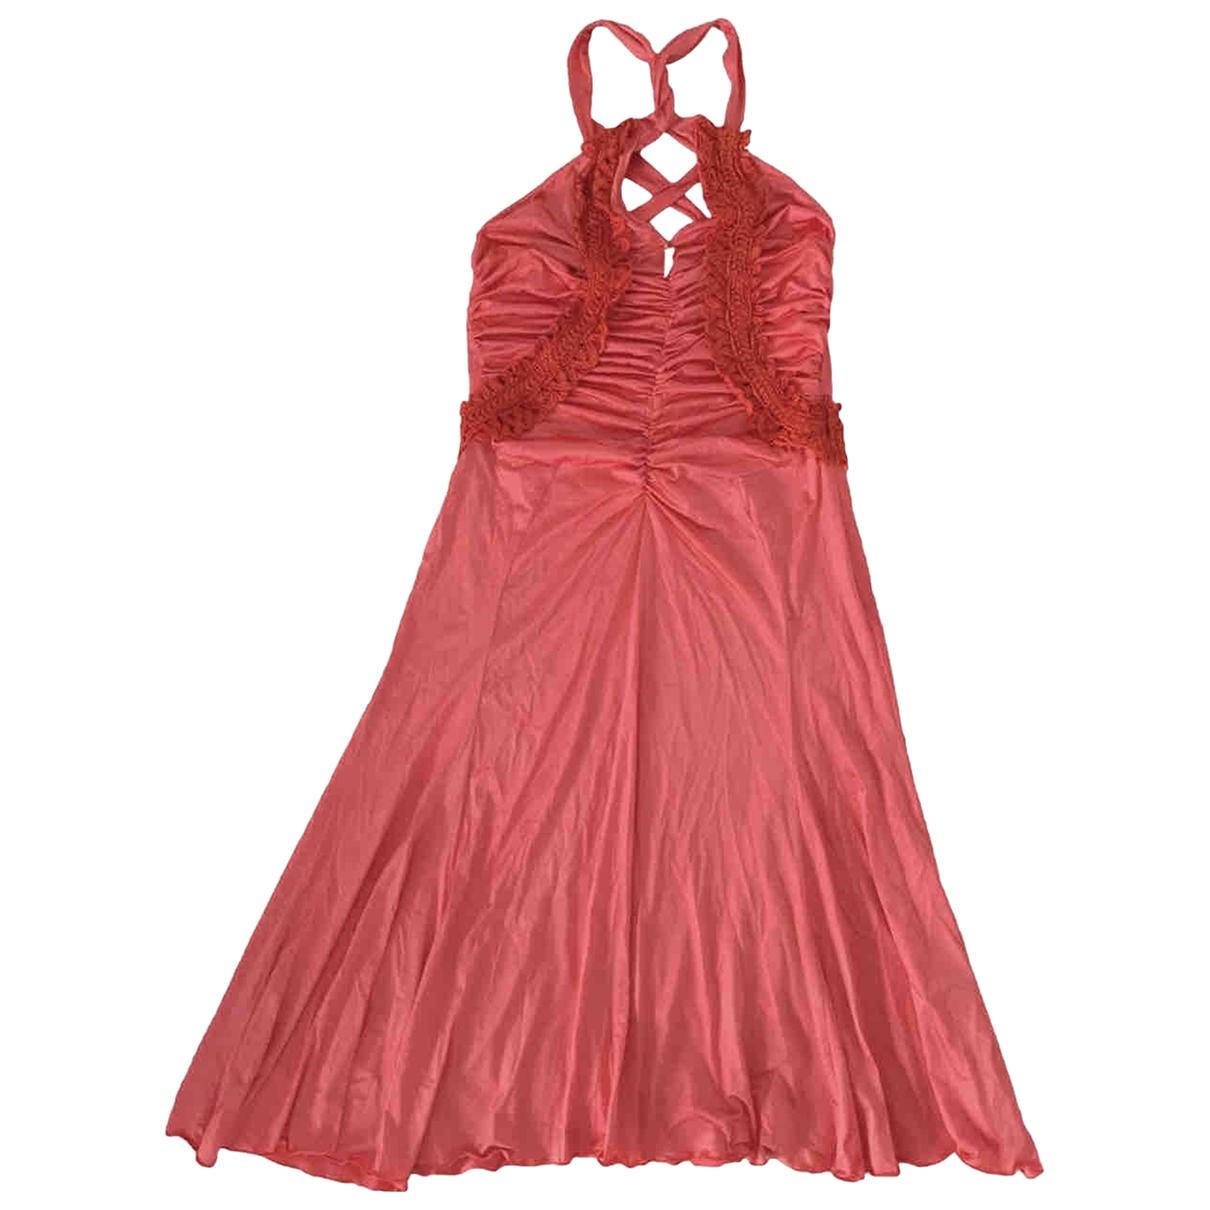 Roberto Cavalli \N Red dress for Women 36 FR